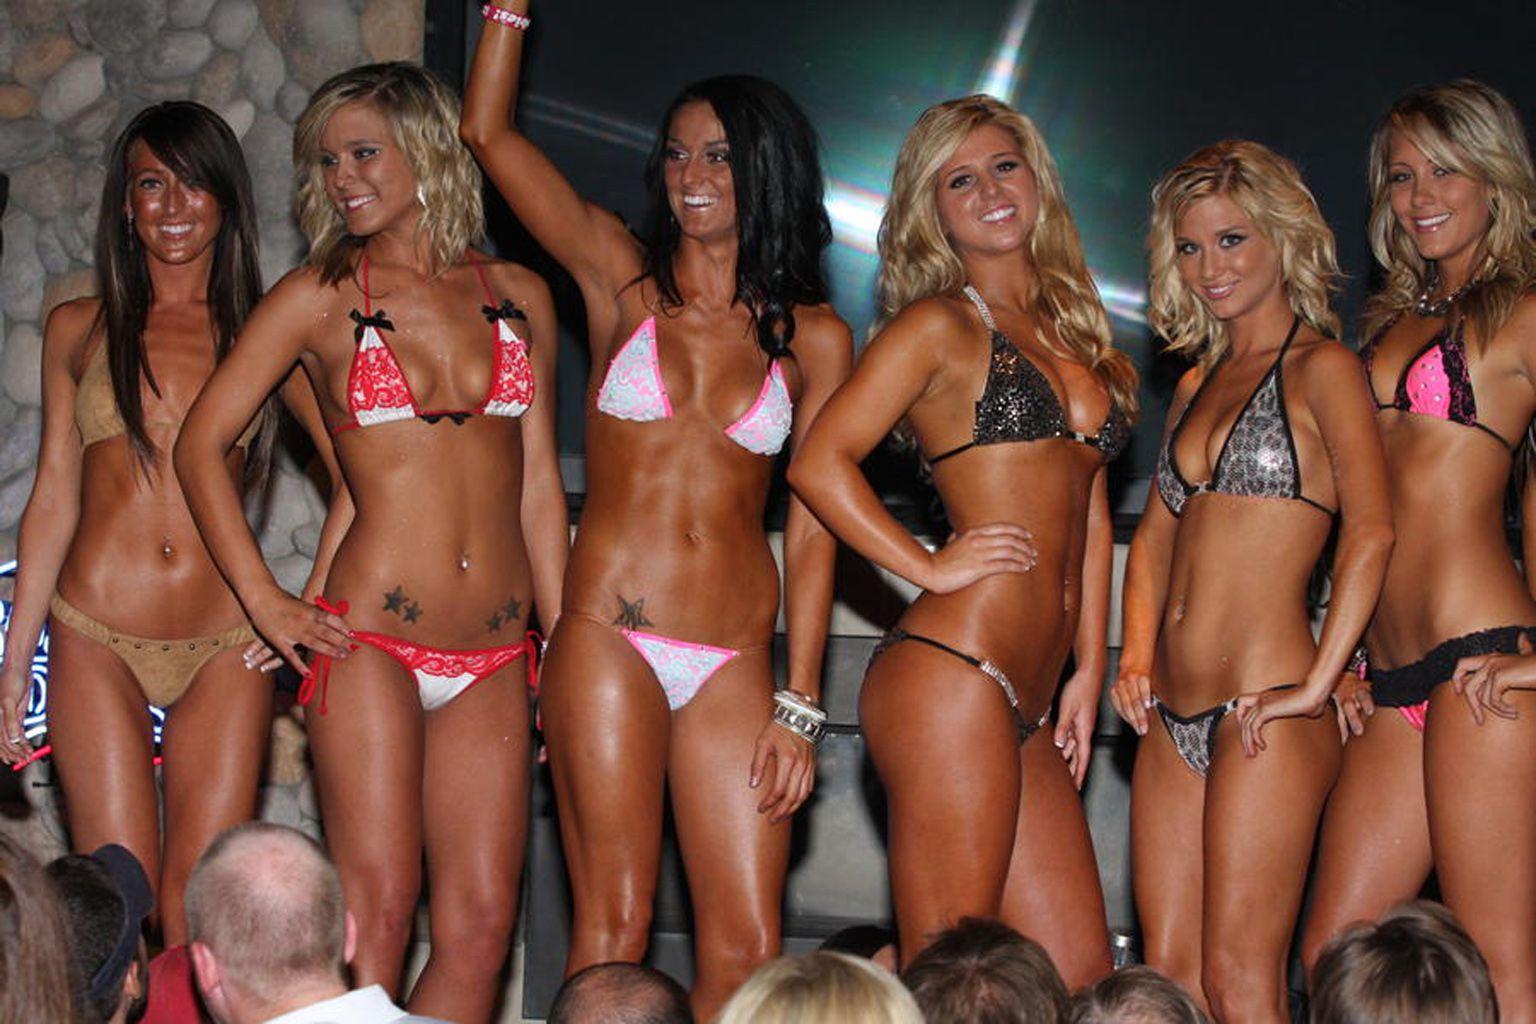 Brat bikini contest and nude